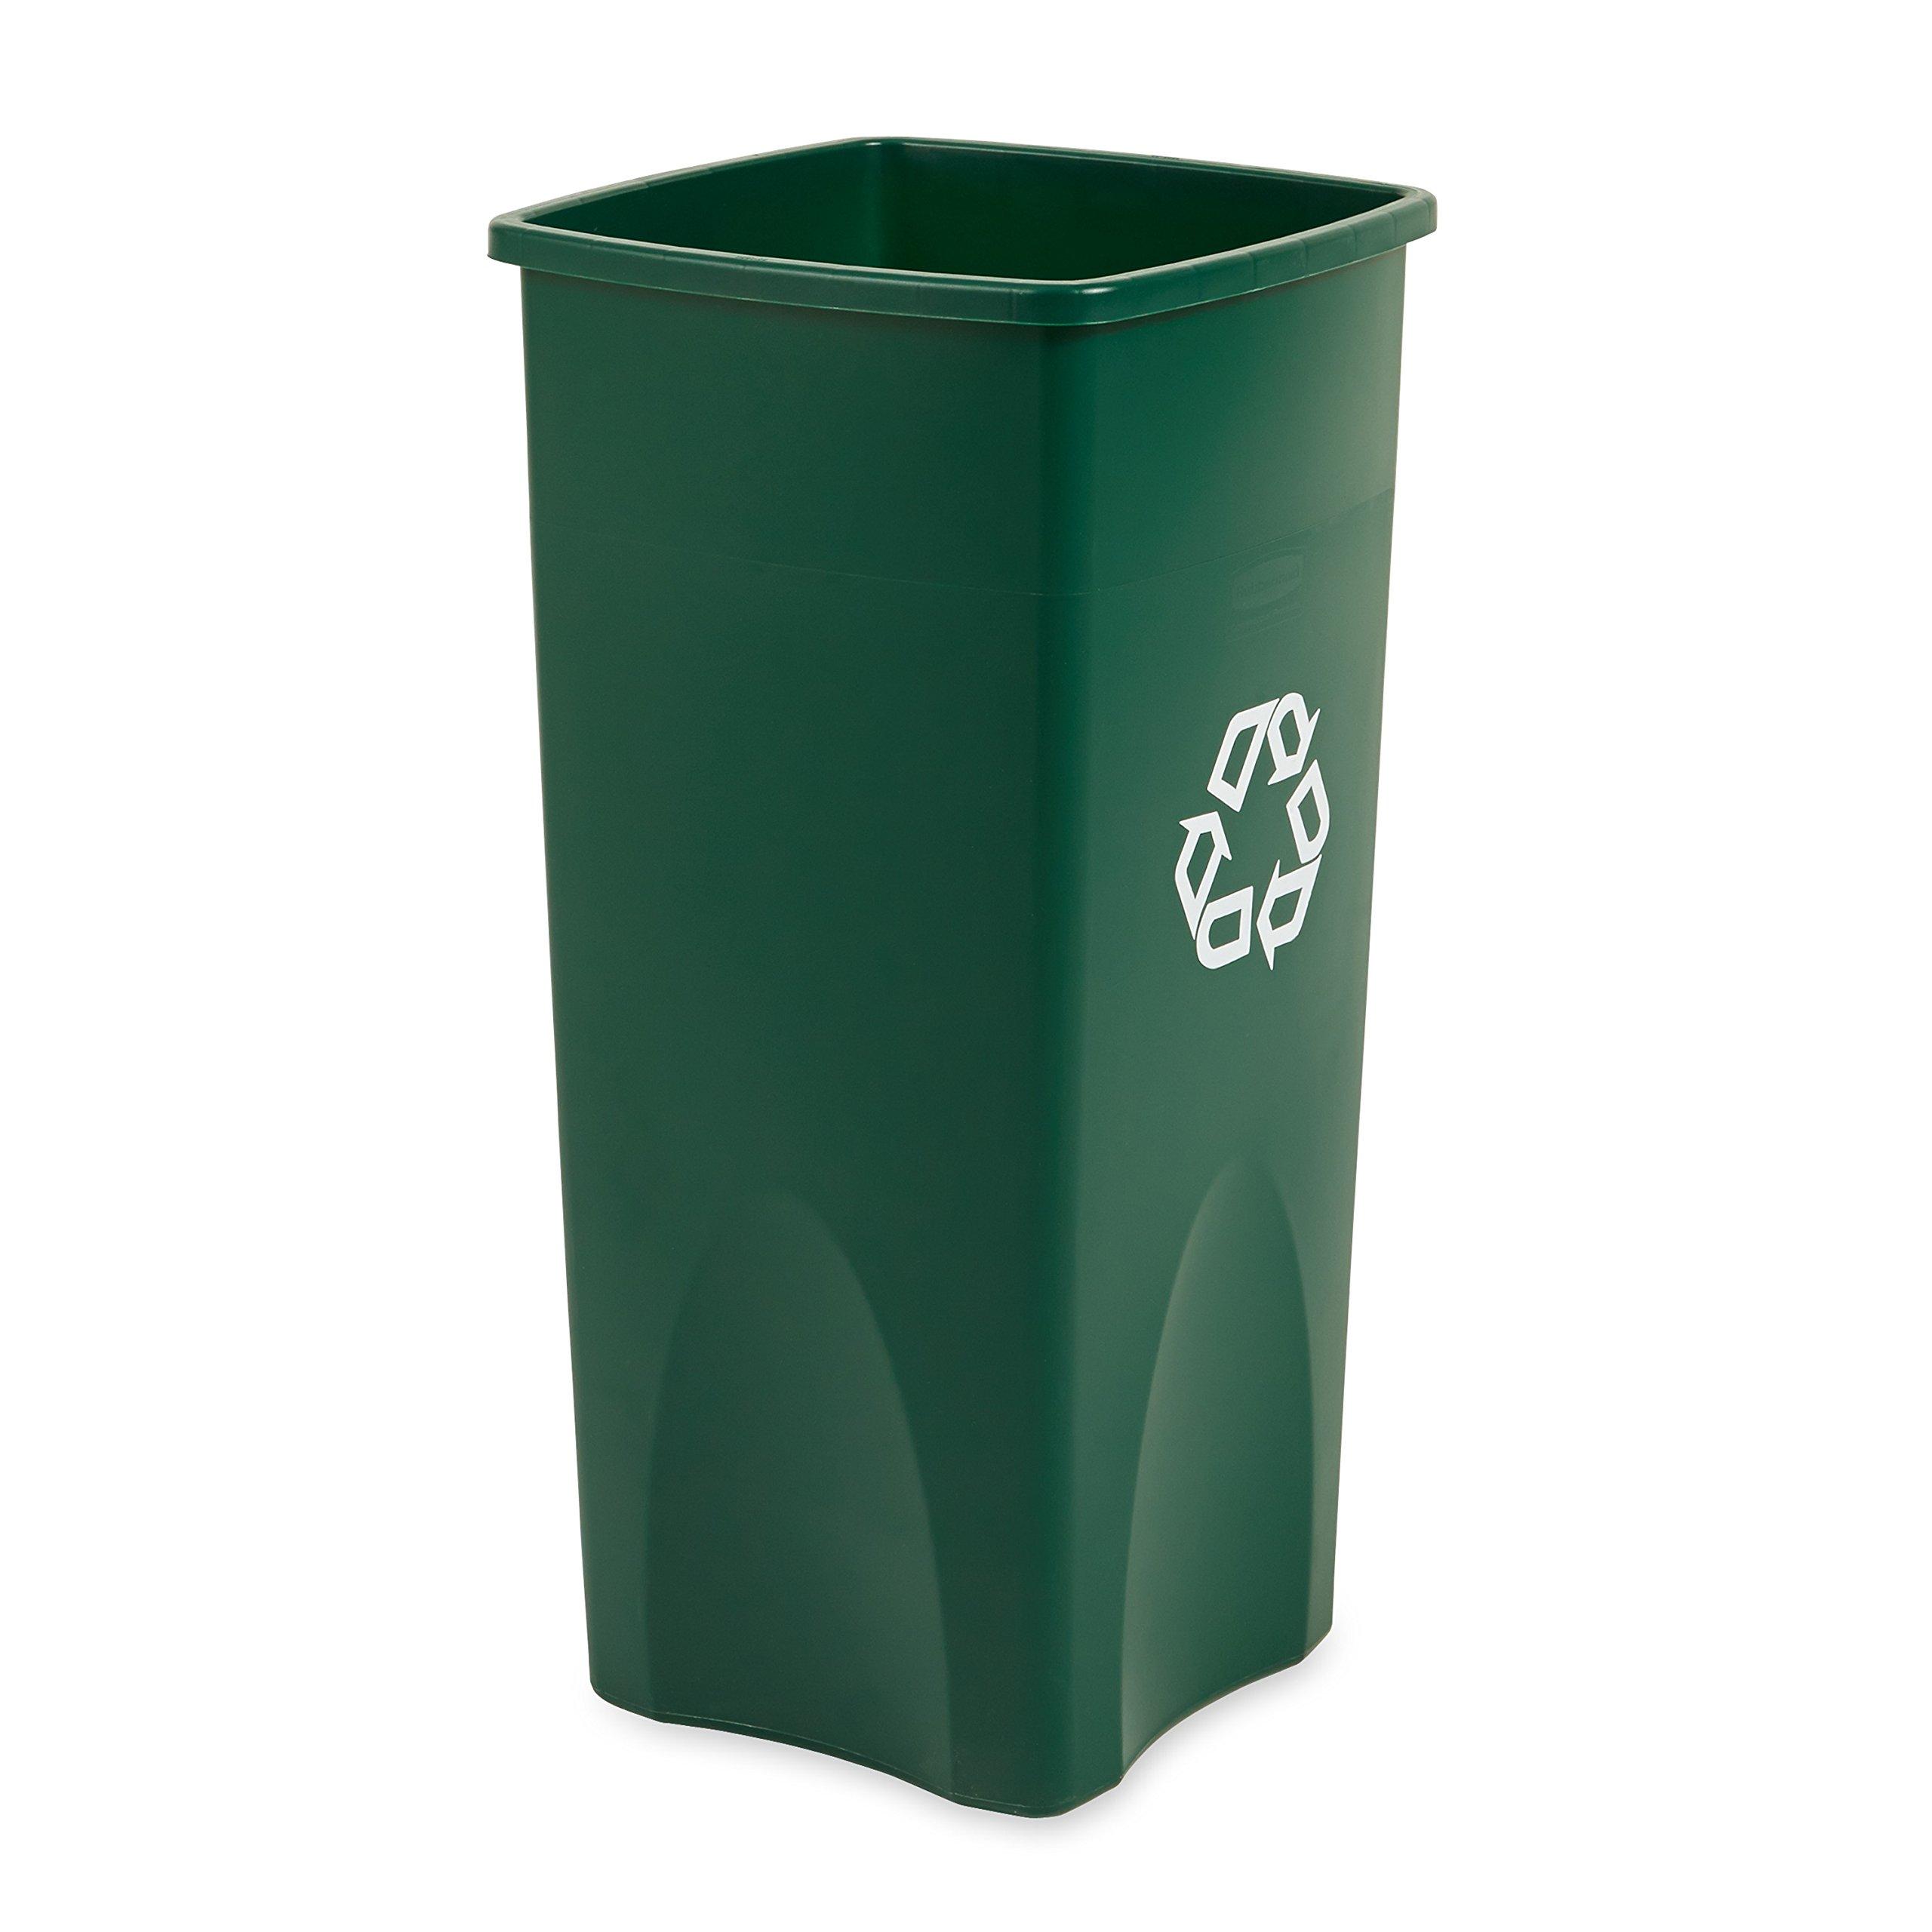 Rubbermaid Commercial Untouchable Recycling Bin, 23 Gallon, Green, FG356907GRN